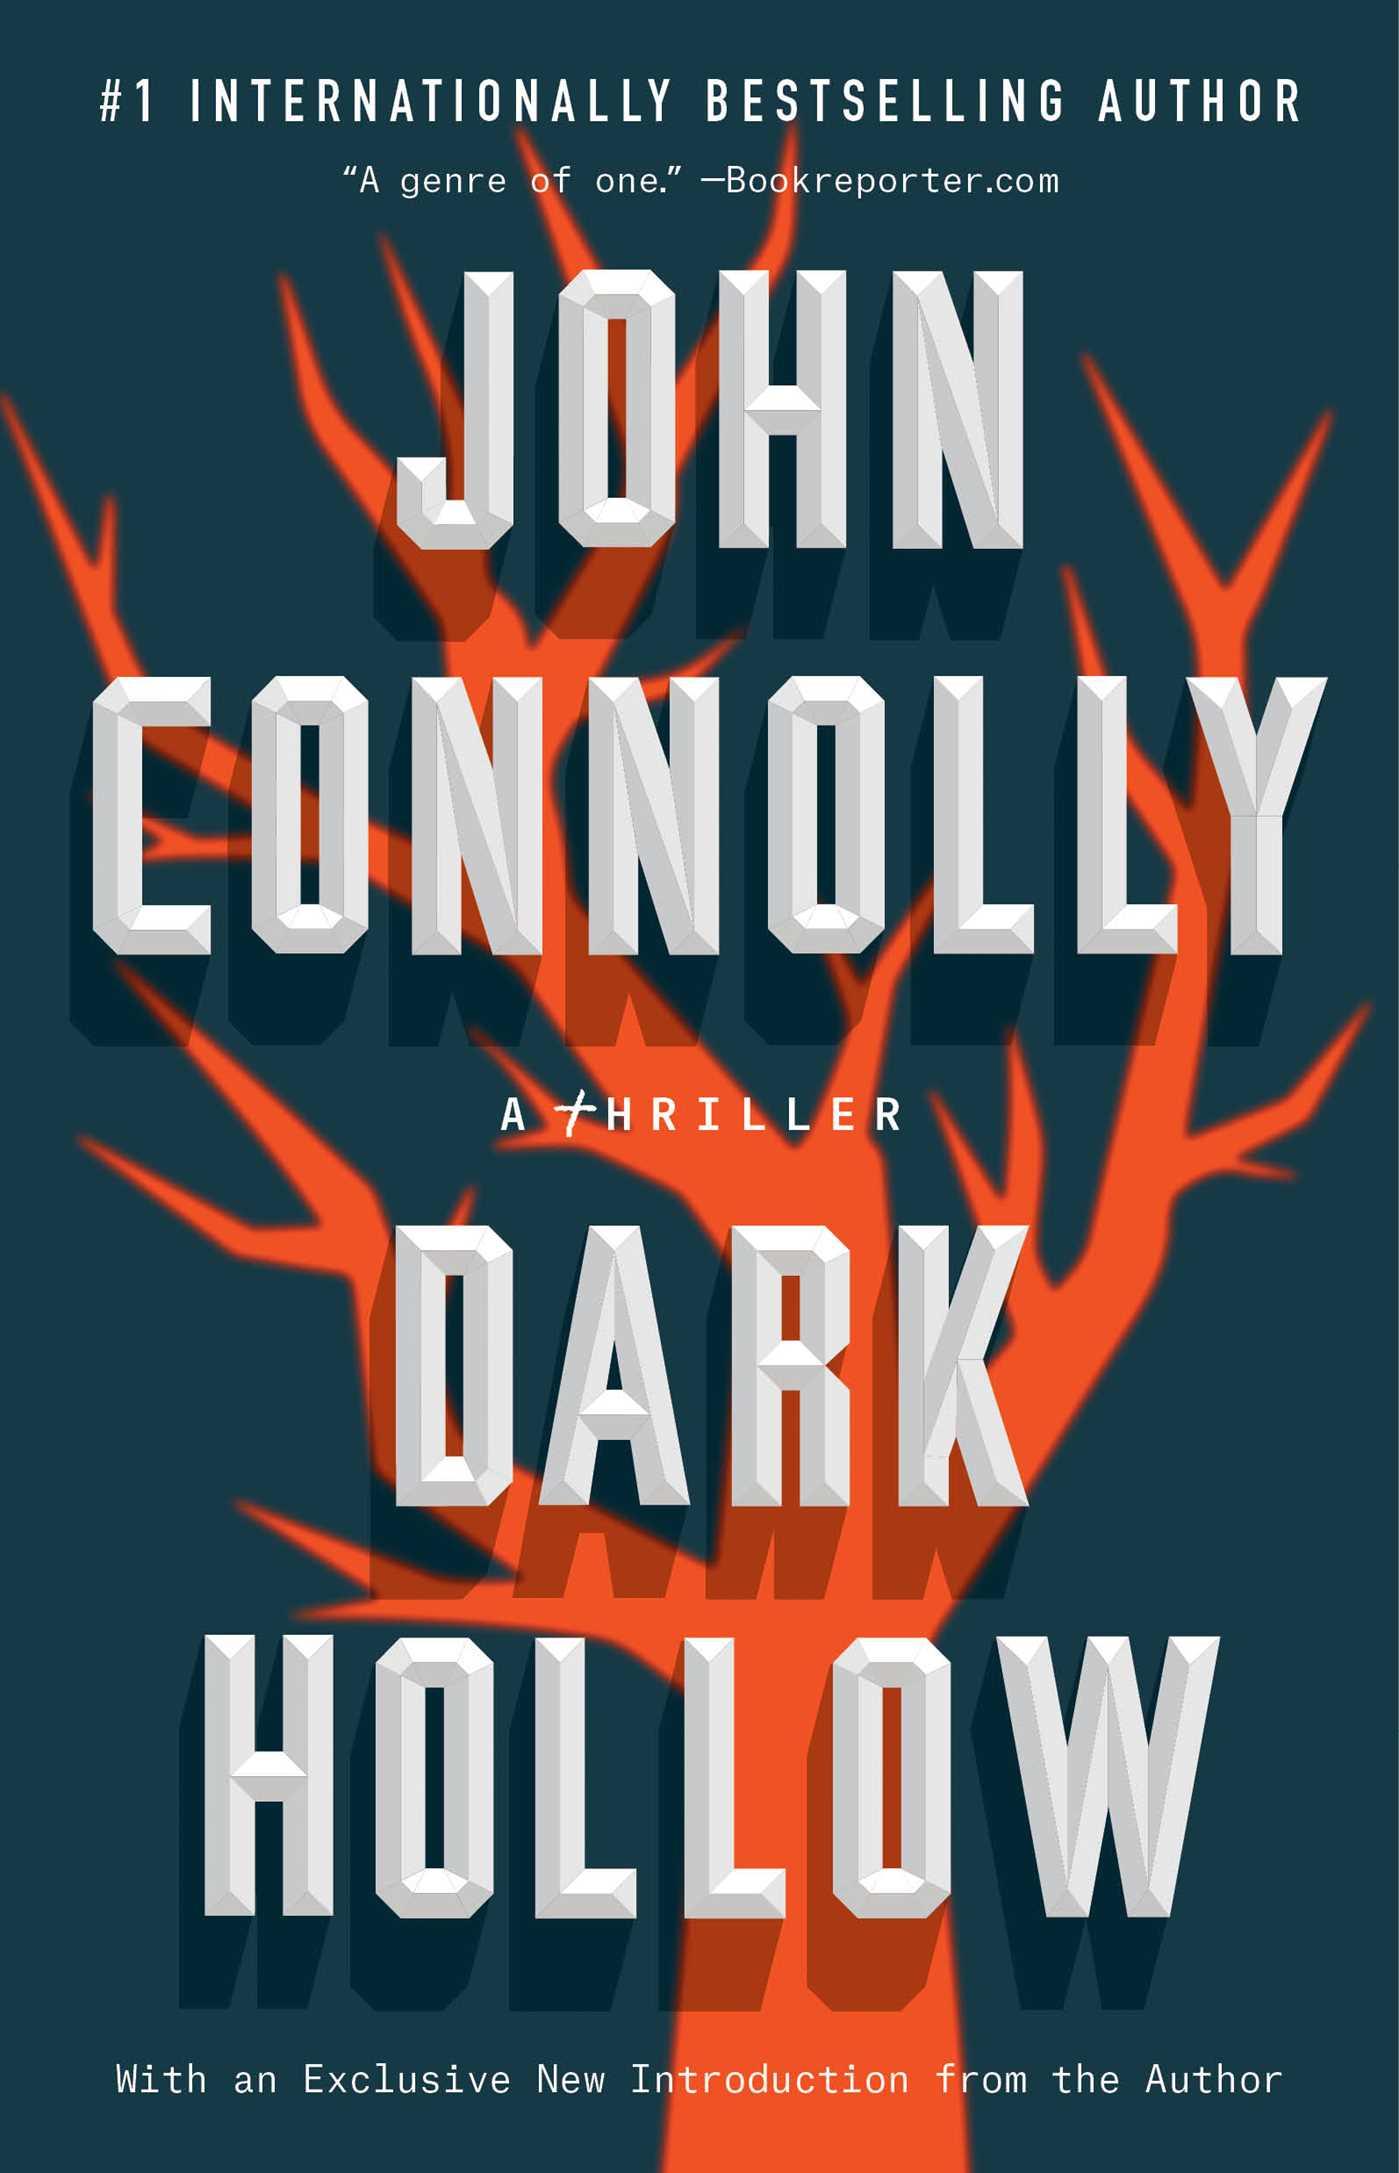 Book Cover Image (jpg): Dark Hollow